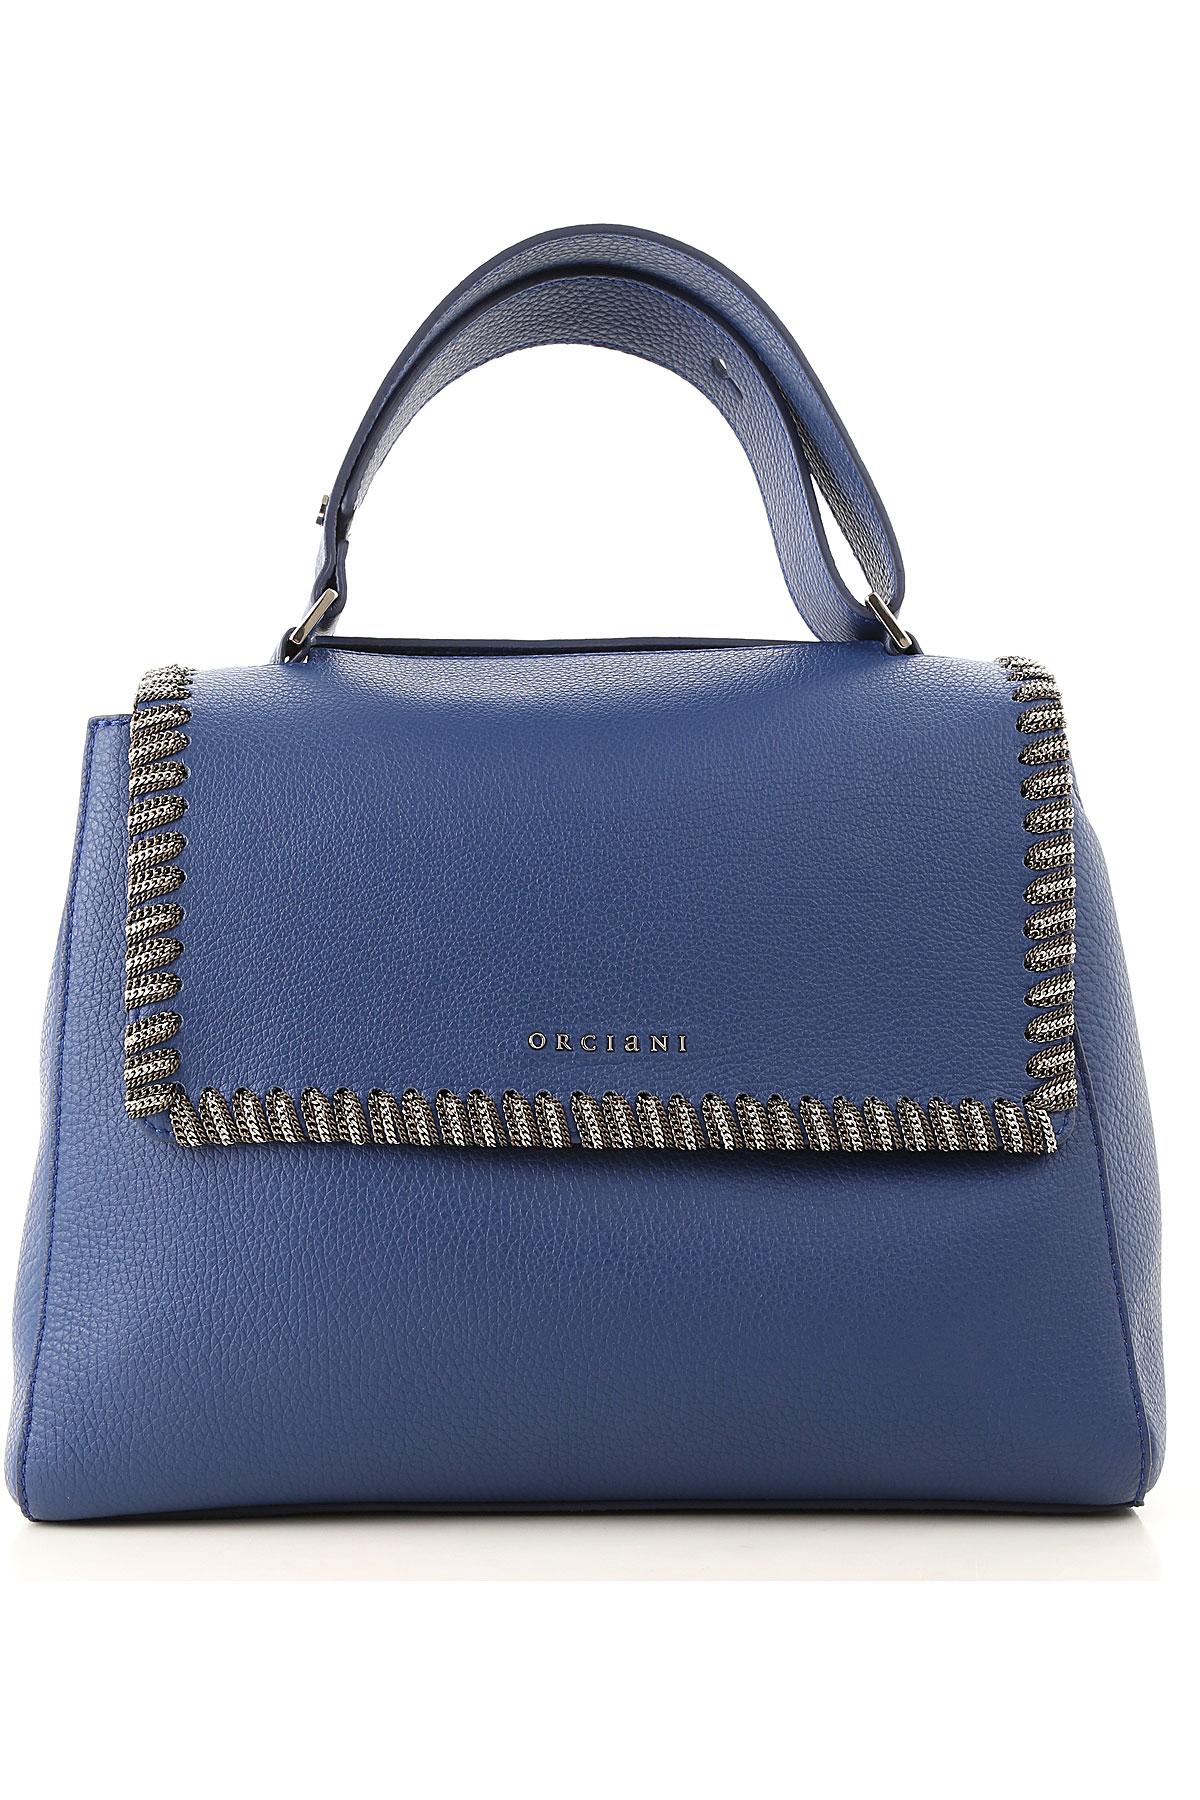 Orciani Top Handle Handbag On Sale, Bluette, Leather, 2019